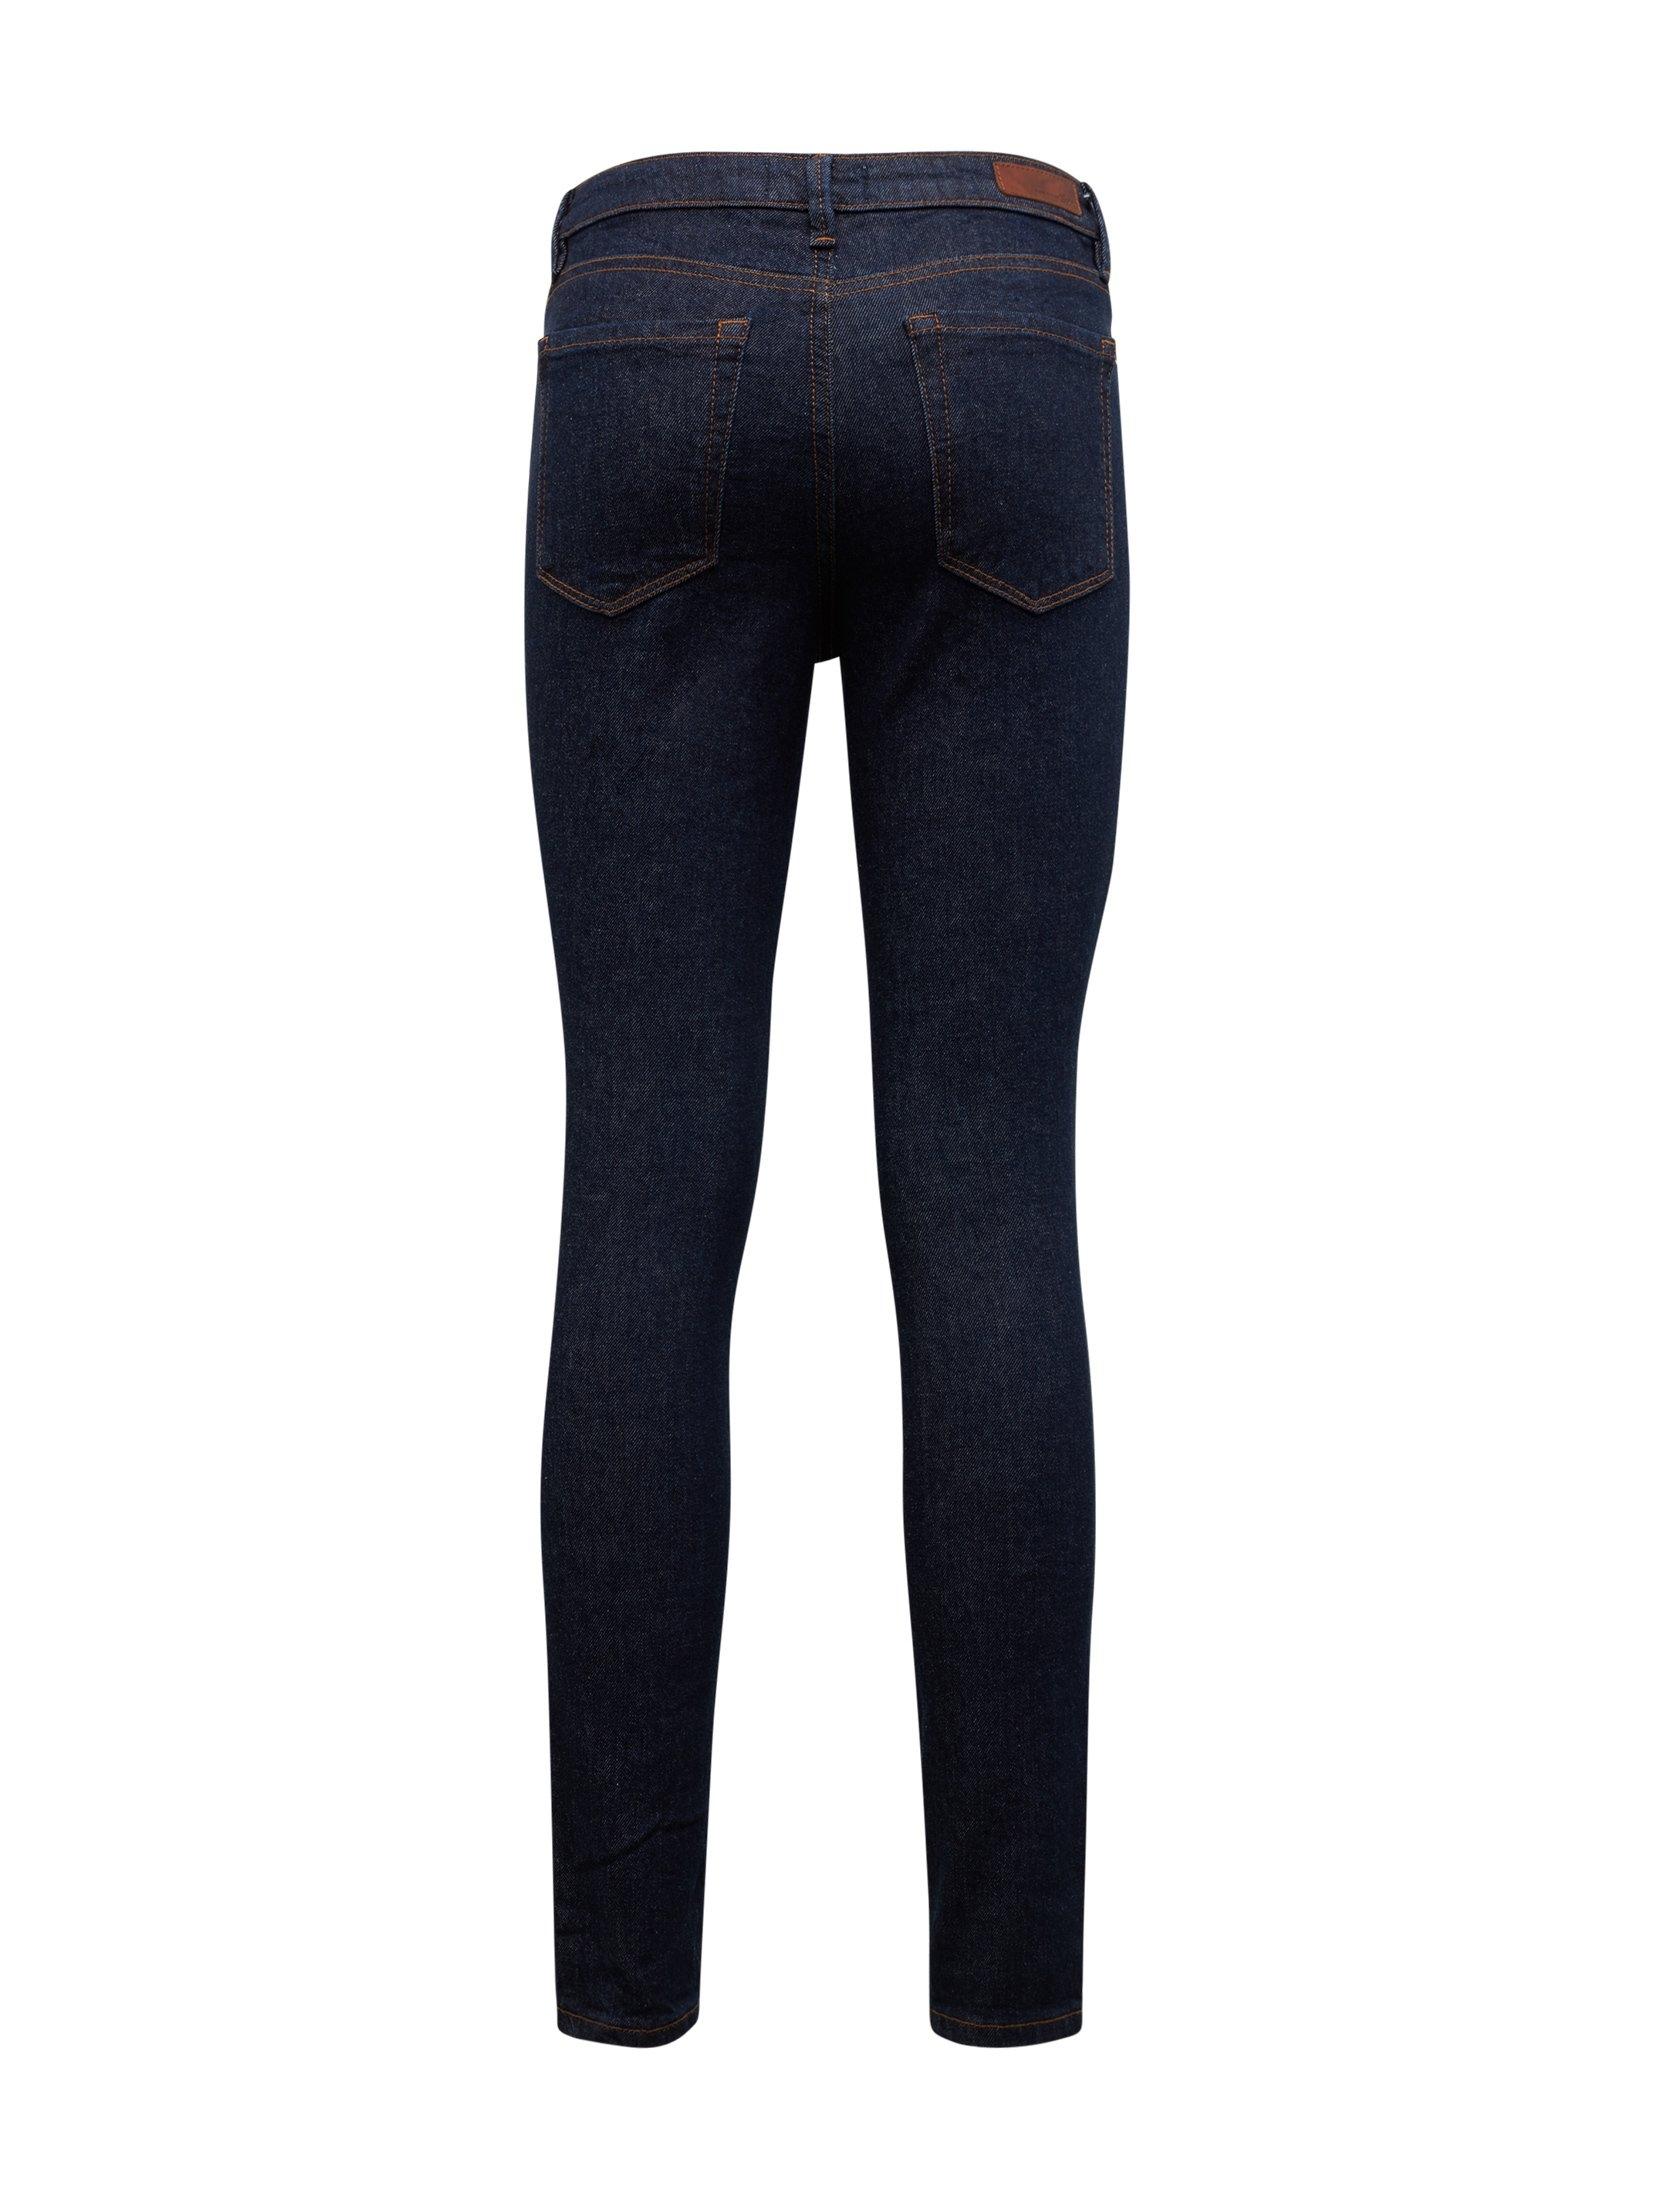 Nu Denim Skinny Bestellen Extra Tailor Jeansjanna Online Tom Jeans wPliXZTkOu